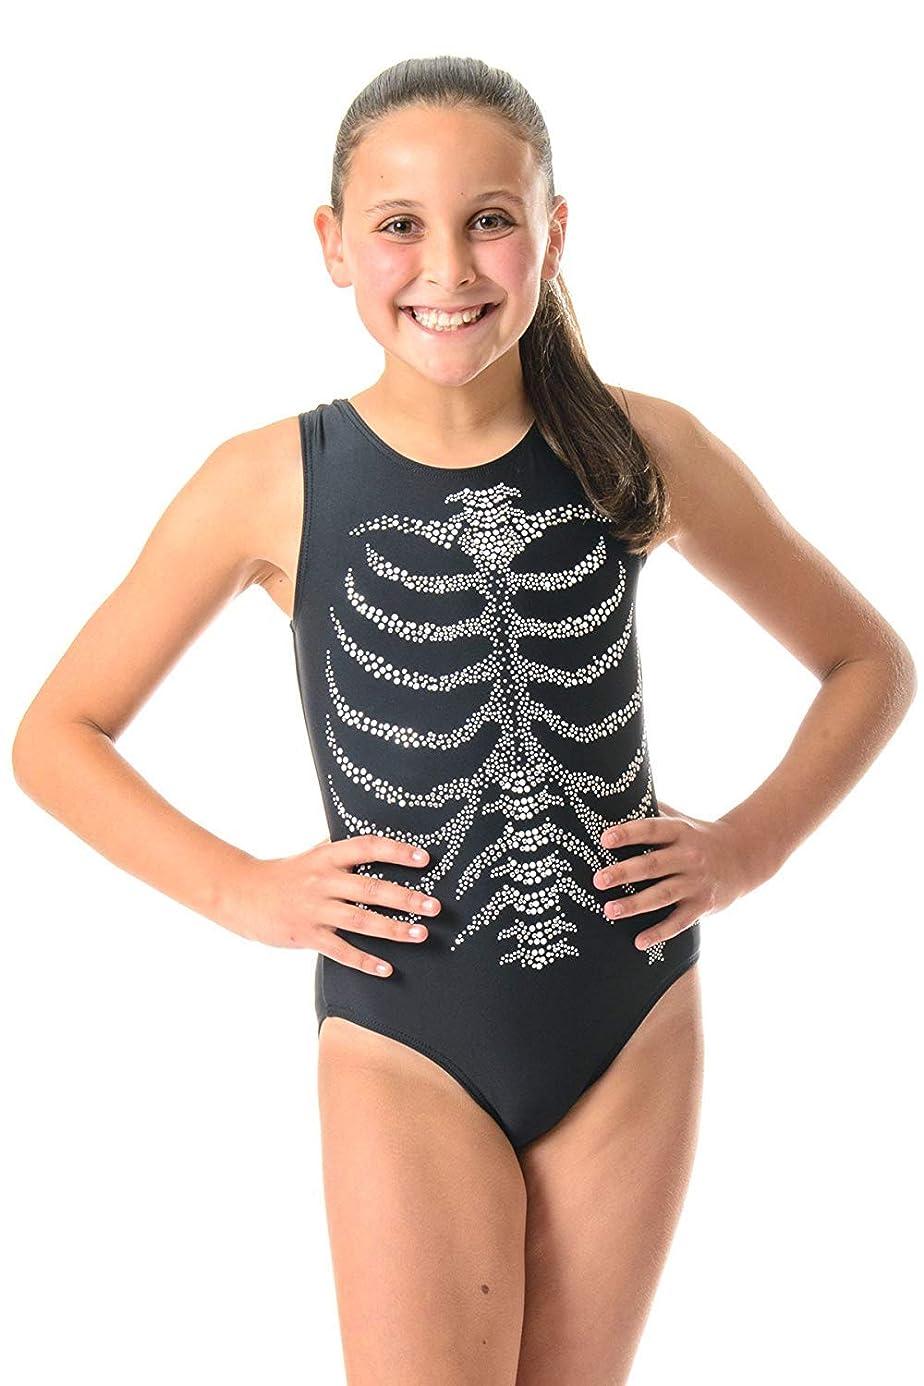 DESTIRA Skeleton Rib Cage Graphic Leotard, CXXS-JR